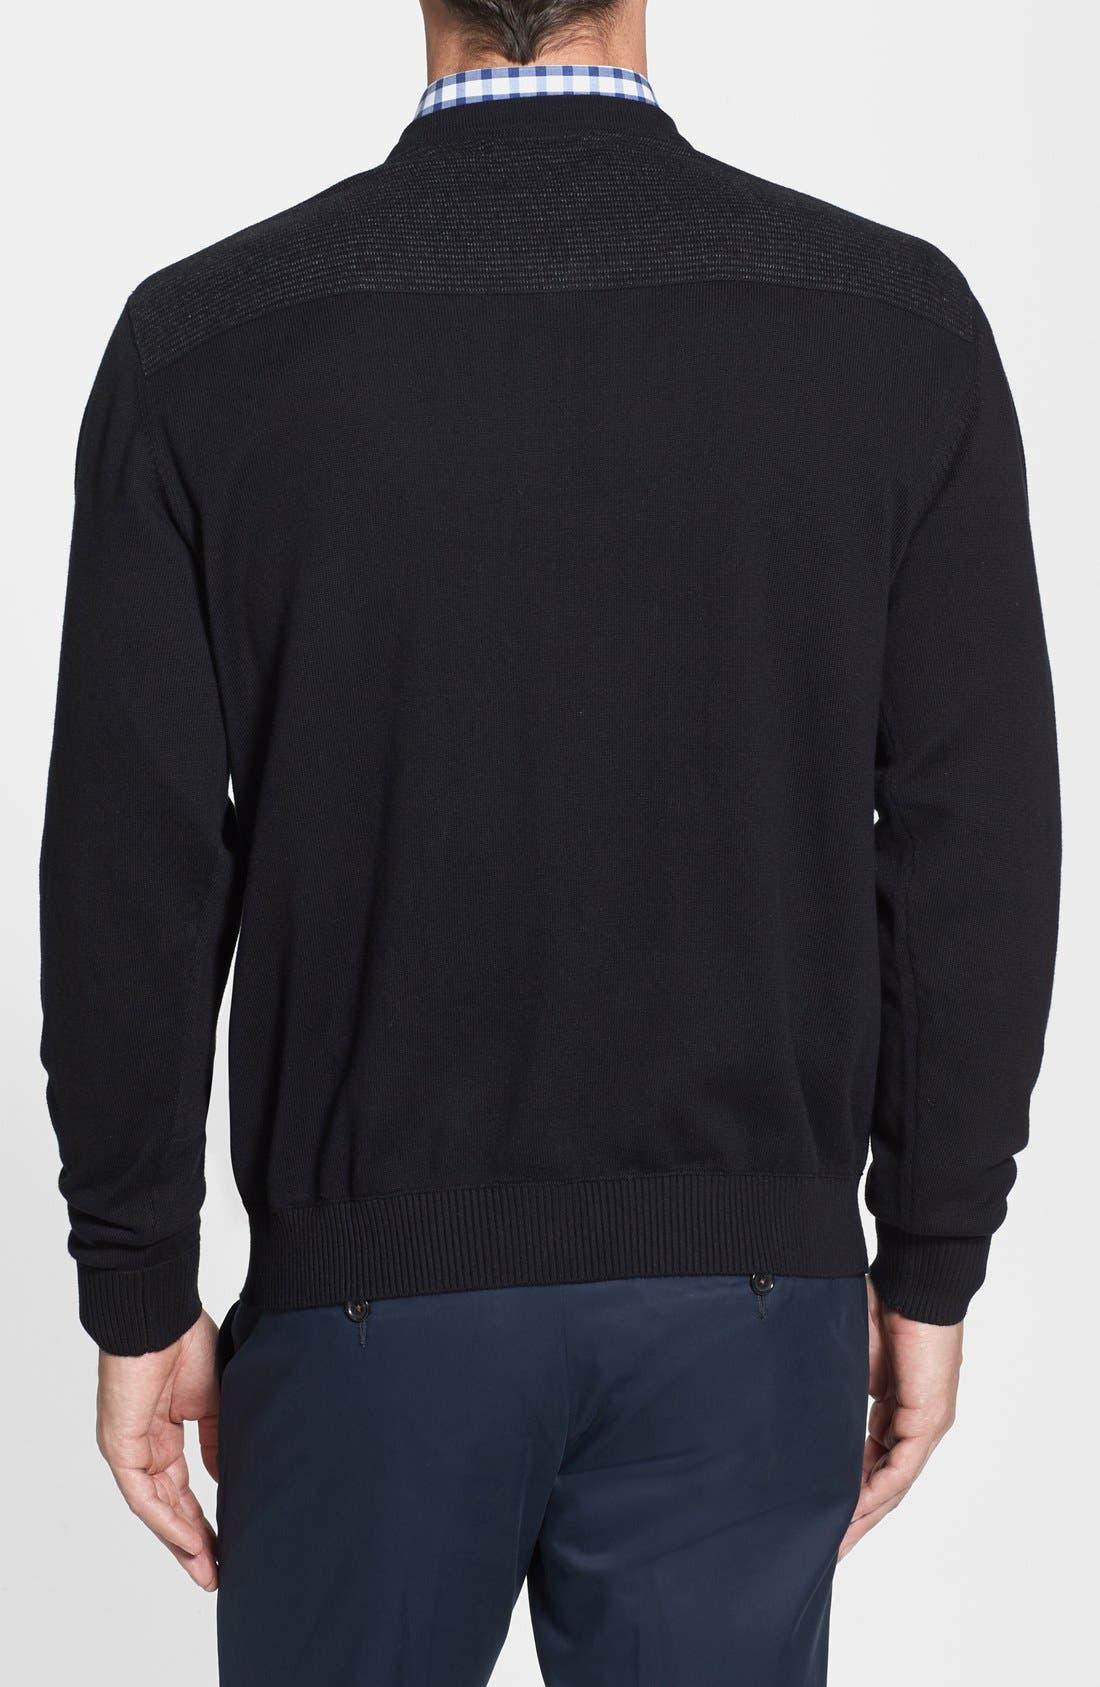 Broadview V-Neck Sweater,                             Alternate thumbnail 2, color,                             001